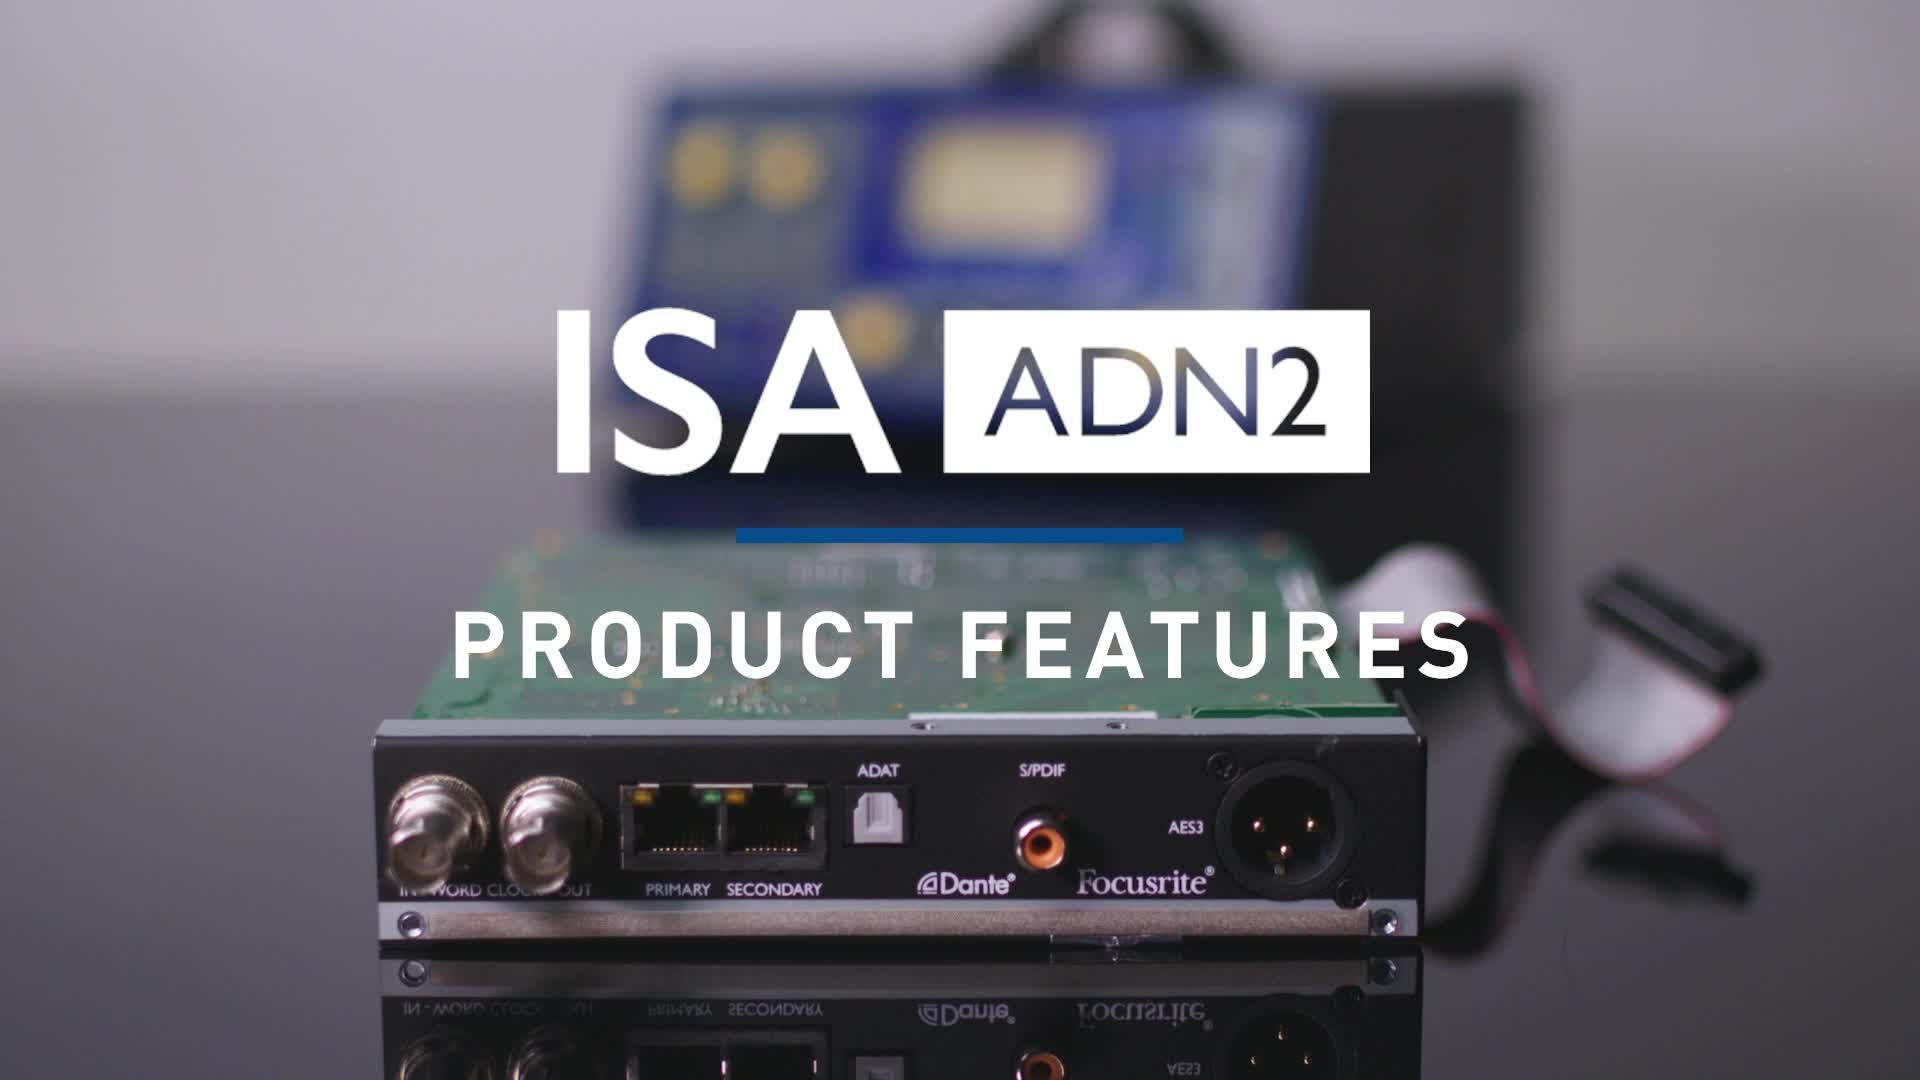 Focusrite - ISA ADN2 Card Overview